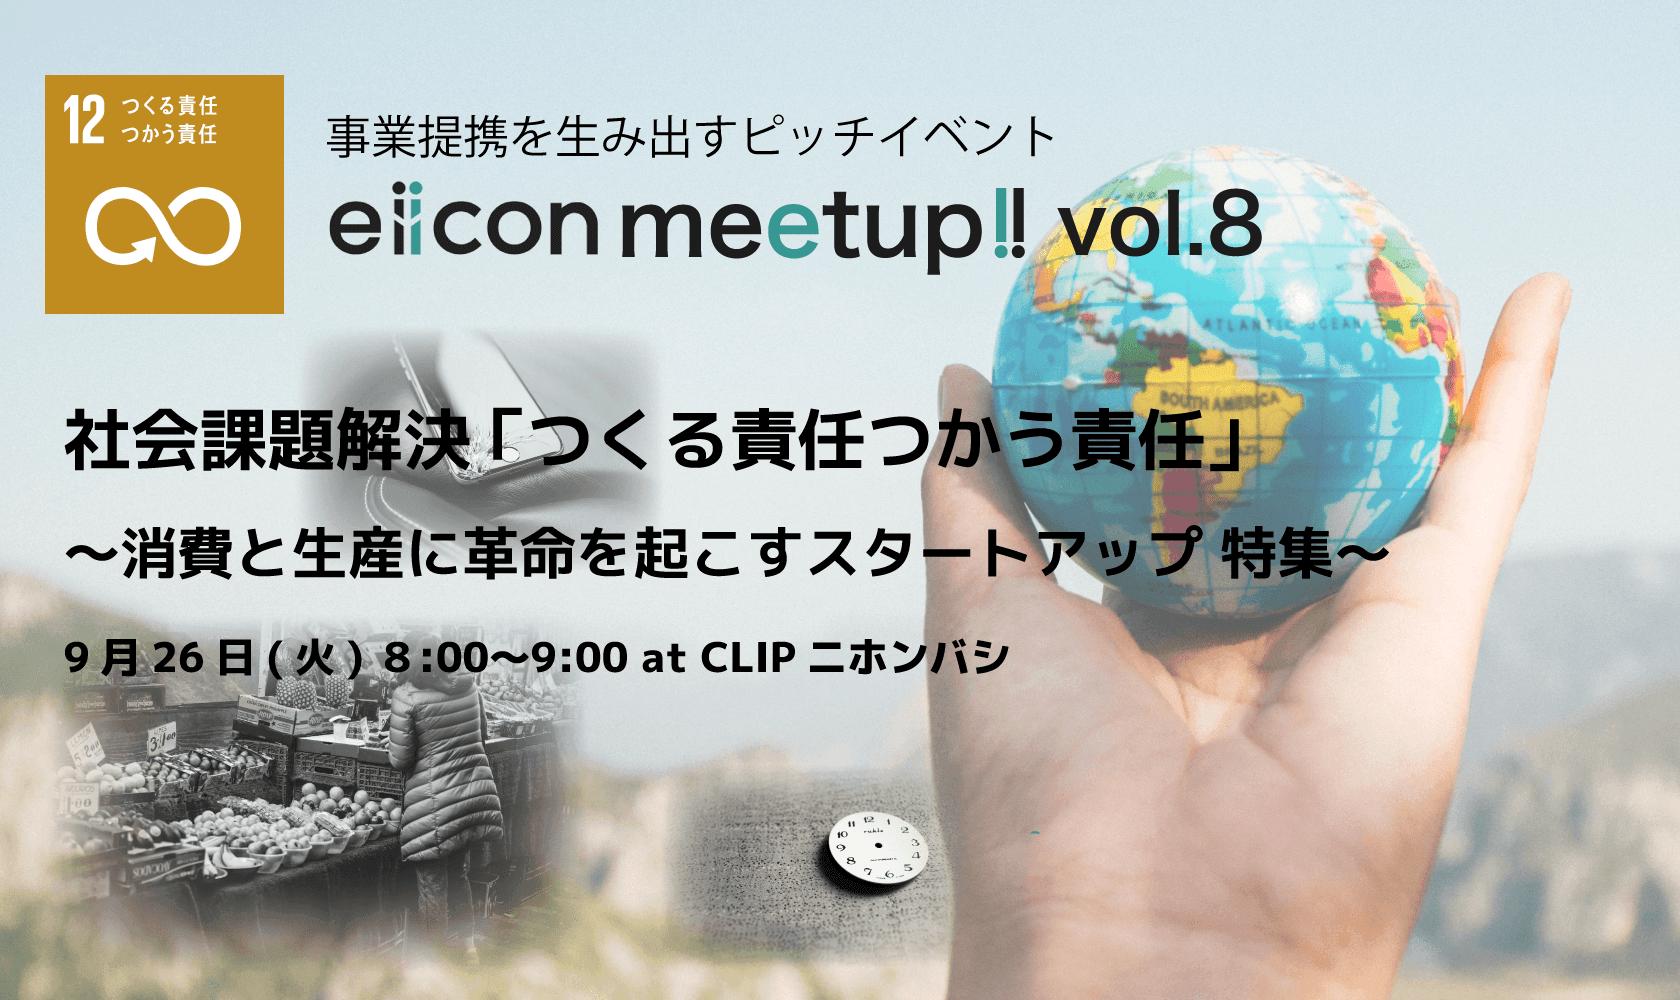 eiicon meet up!!  vol.8 ~社会課題解決 「目標12:つくる責任つかう責任」 消費と生産に革命を起こすスタートアップ 特集~